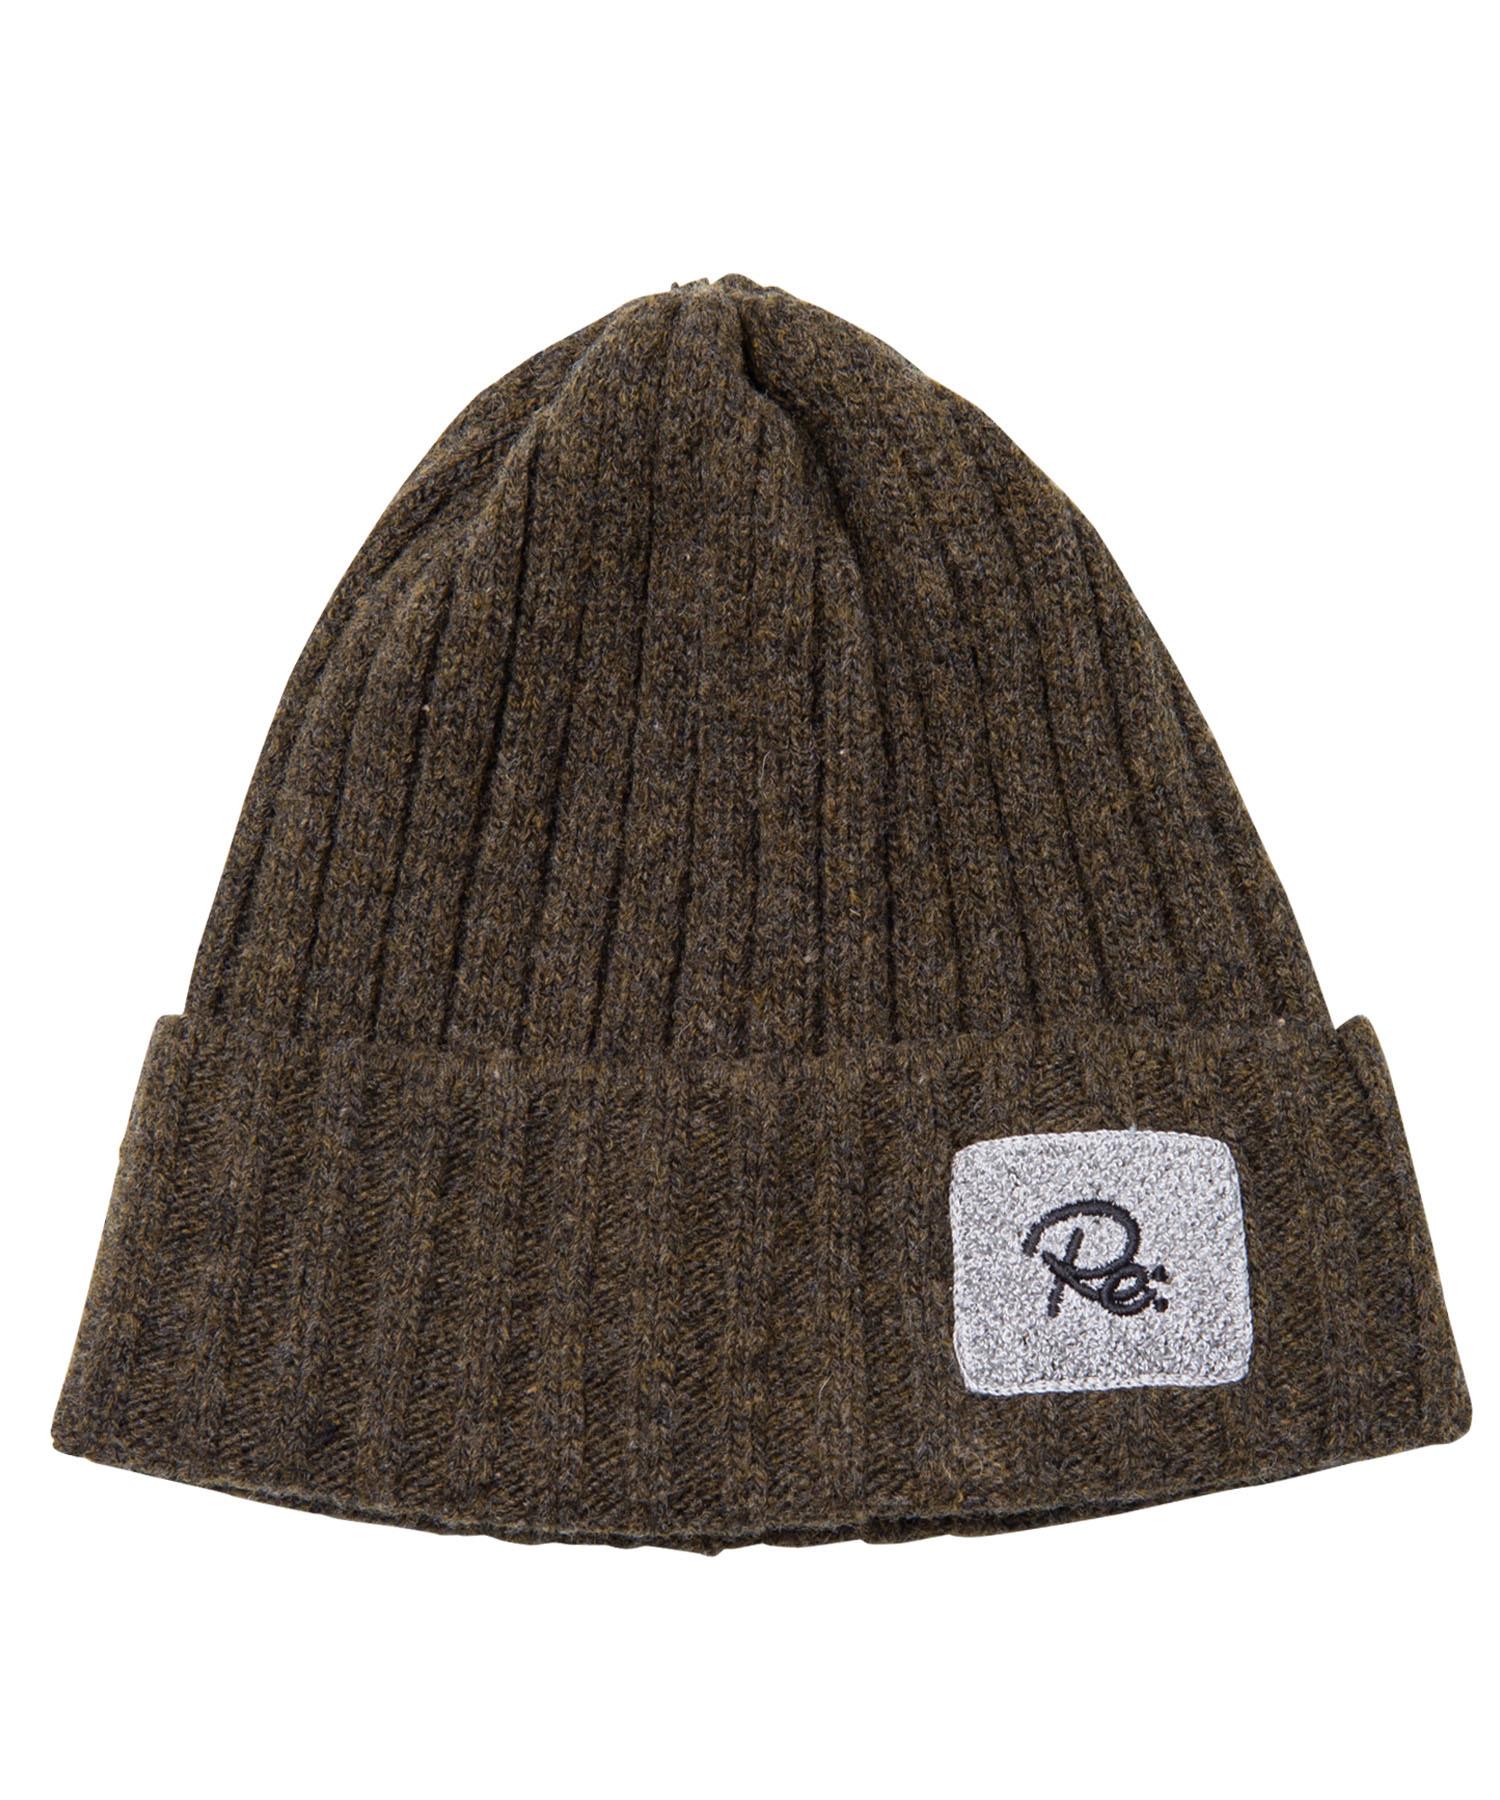 ICON BOX WOOL KNIT CAP[REH076]